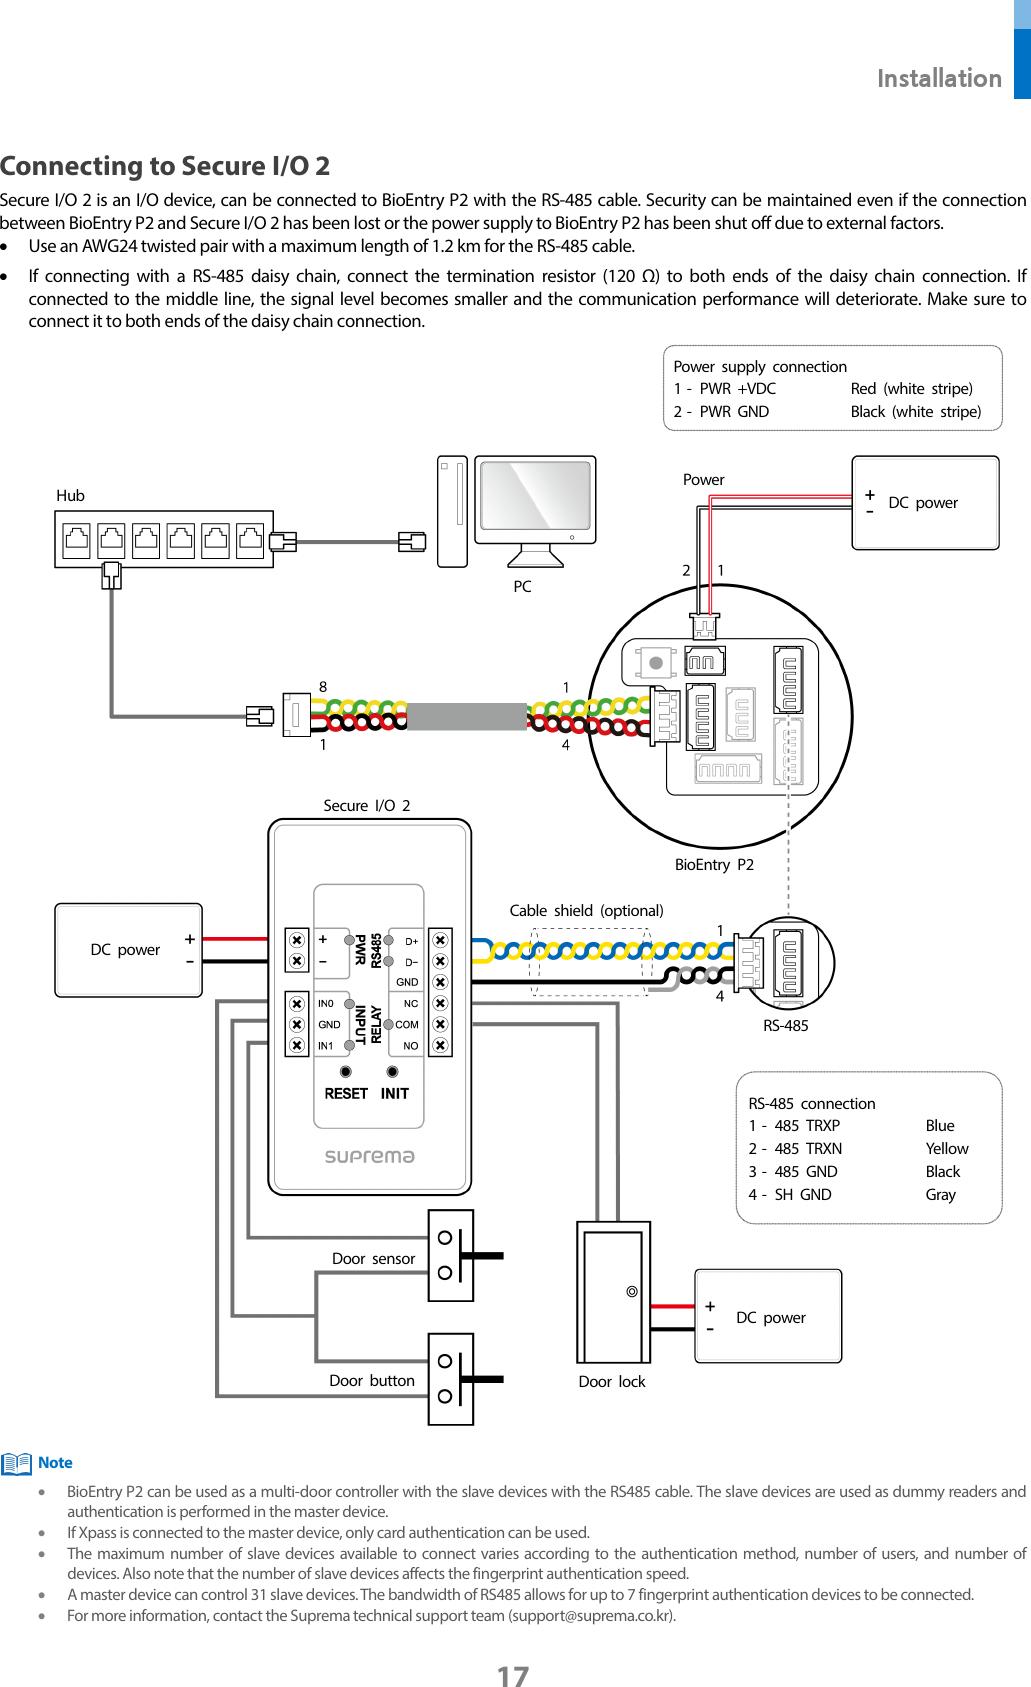 Quantitative Data Of Maximum Force And Maximum Energy Manual Guide